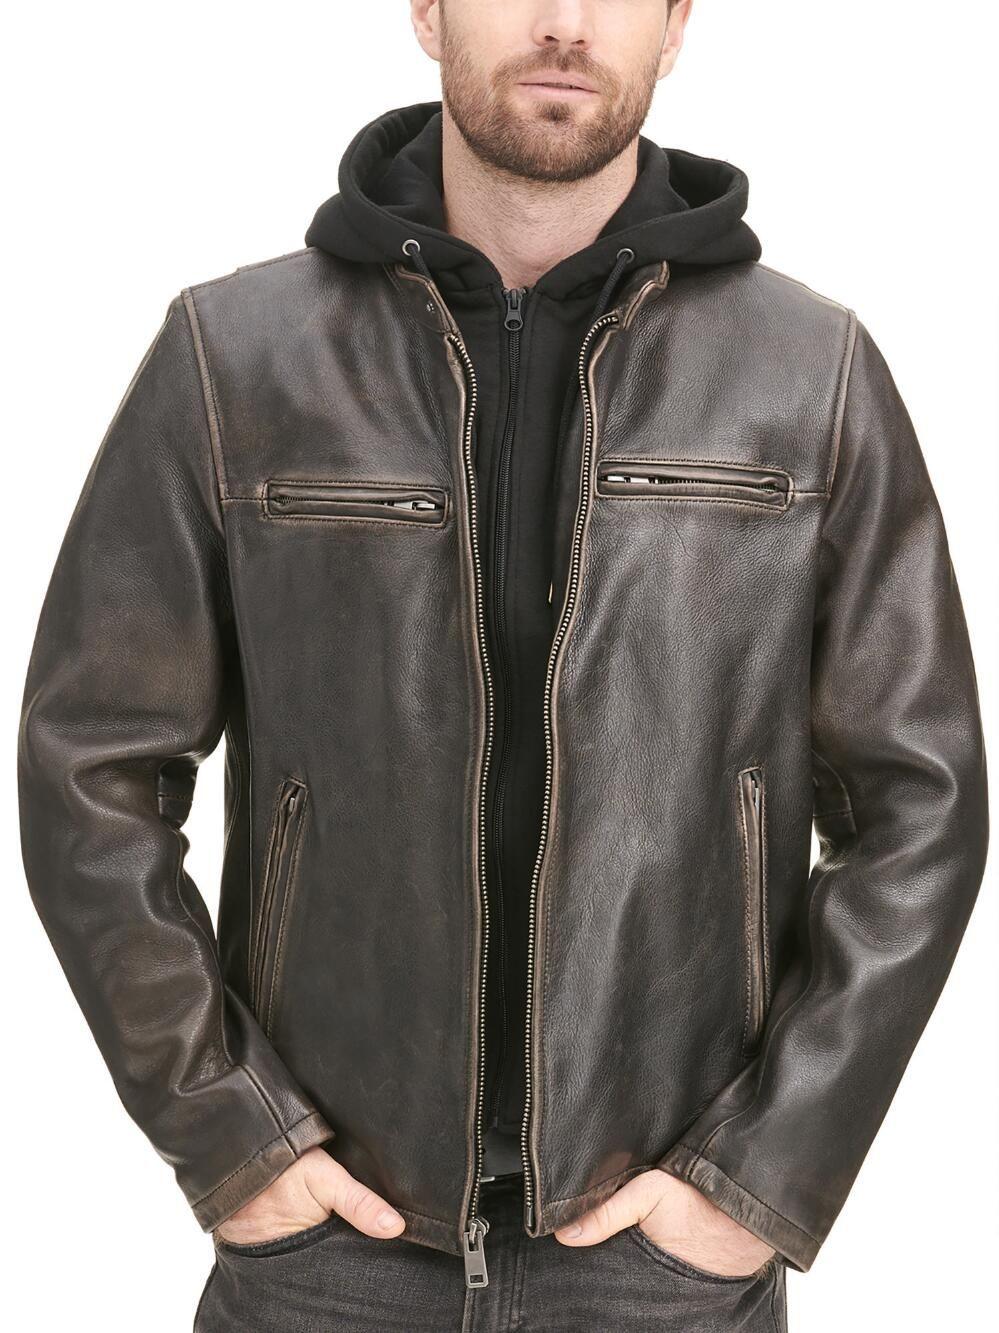 Alan Leather Jacket With Hood Leather Jacket With Hood Leather Jacket Jackets [ 1333 x 999 Pixel ]